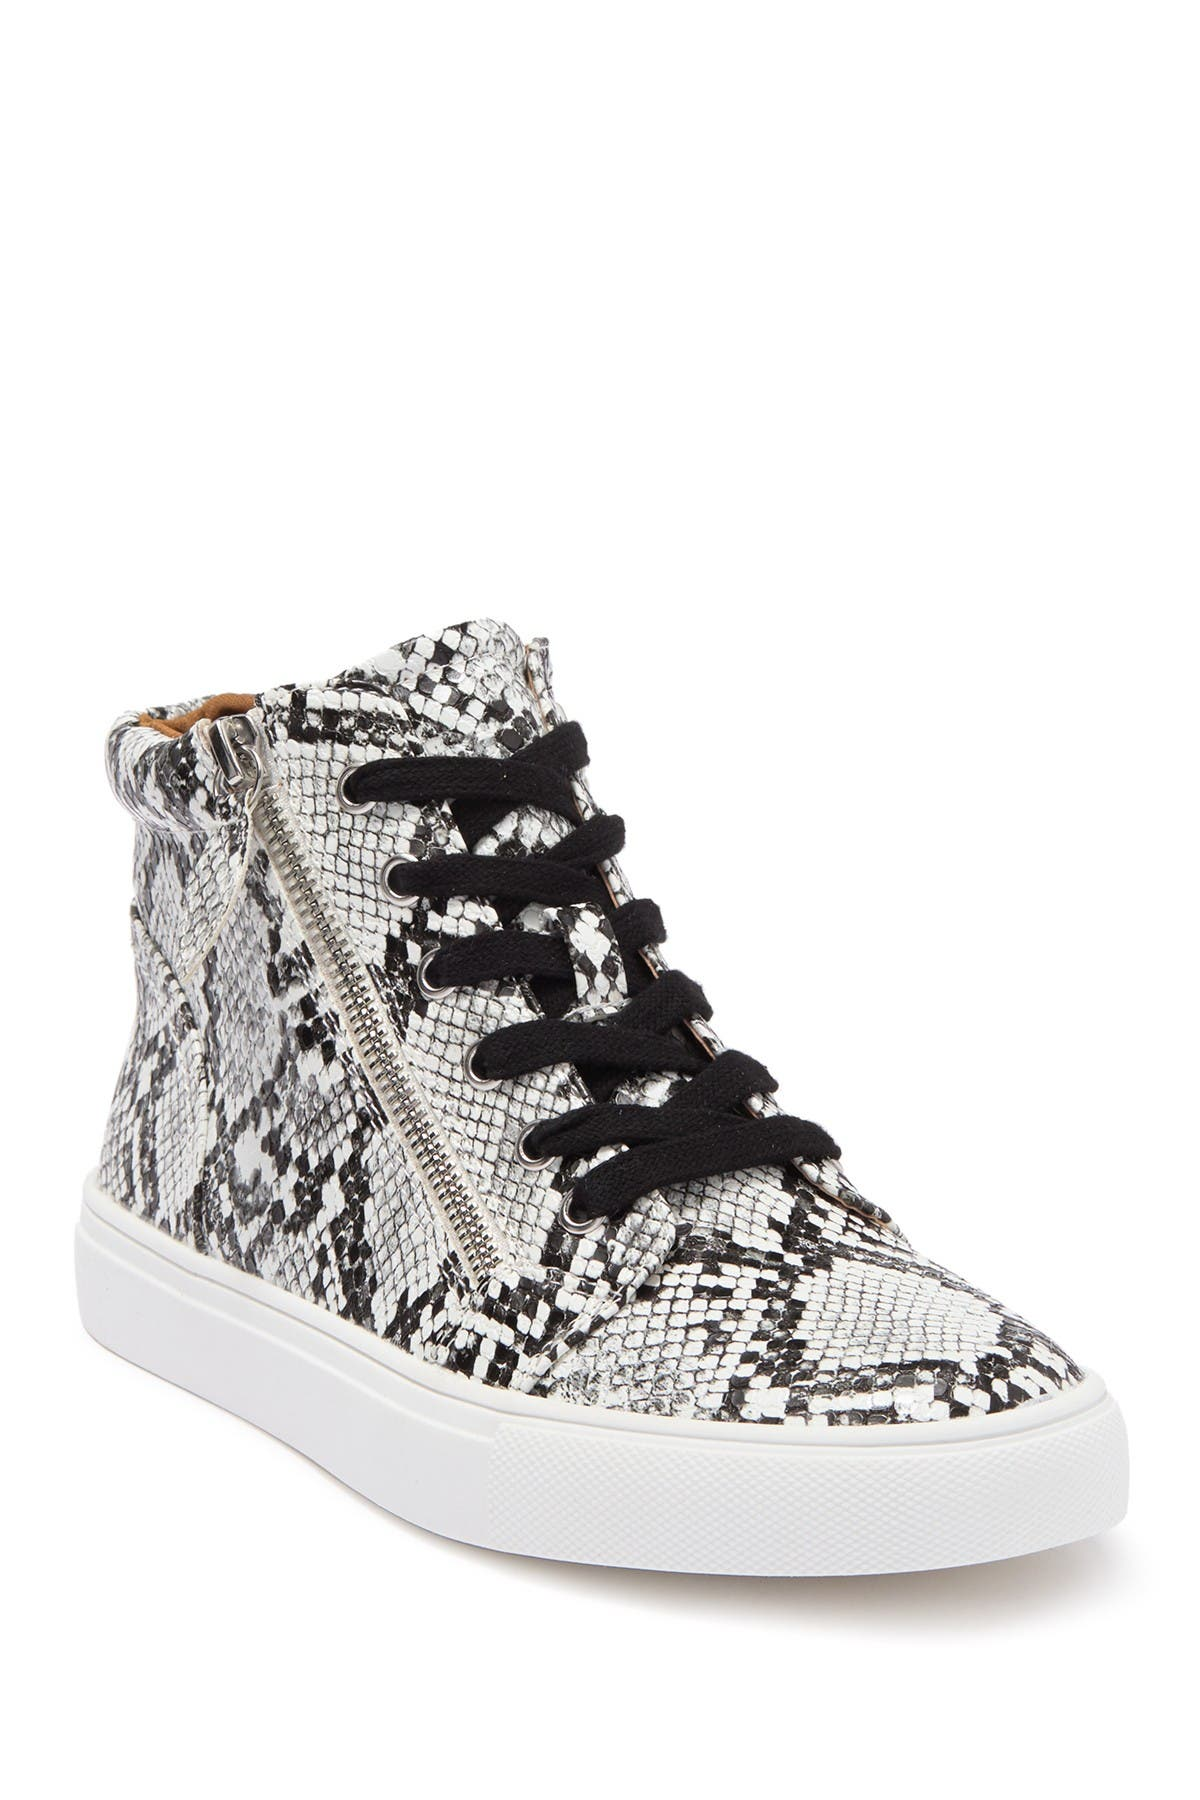 Image of Report Amali High Top Sneaker